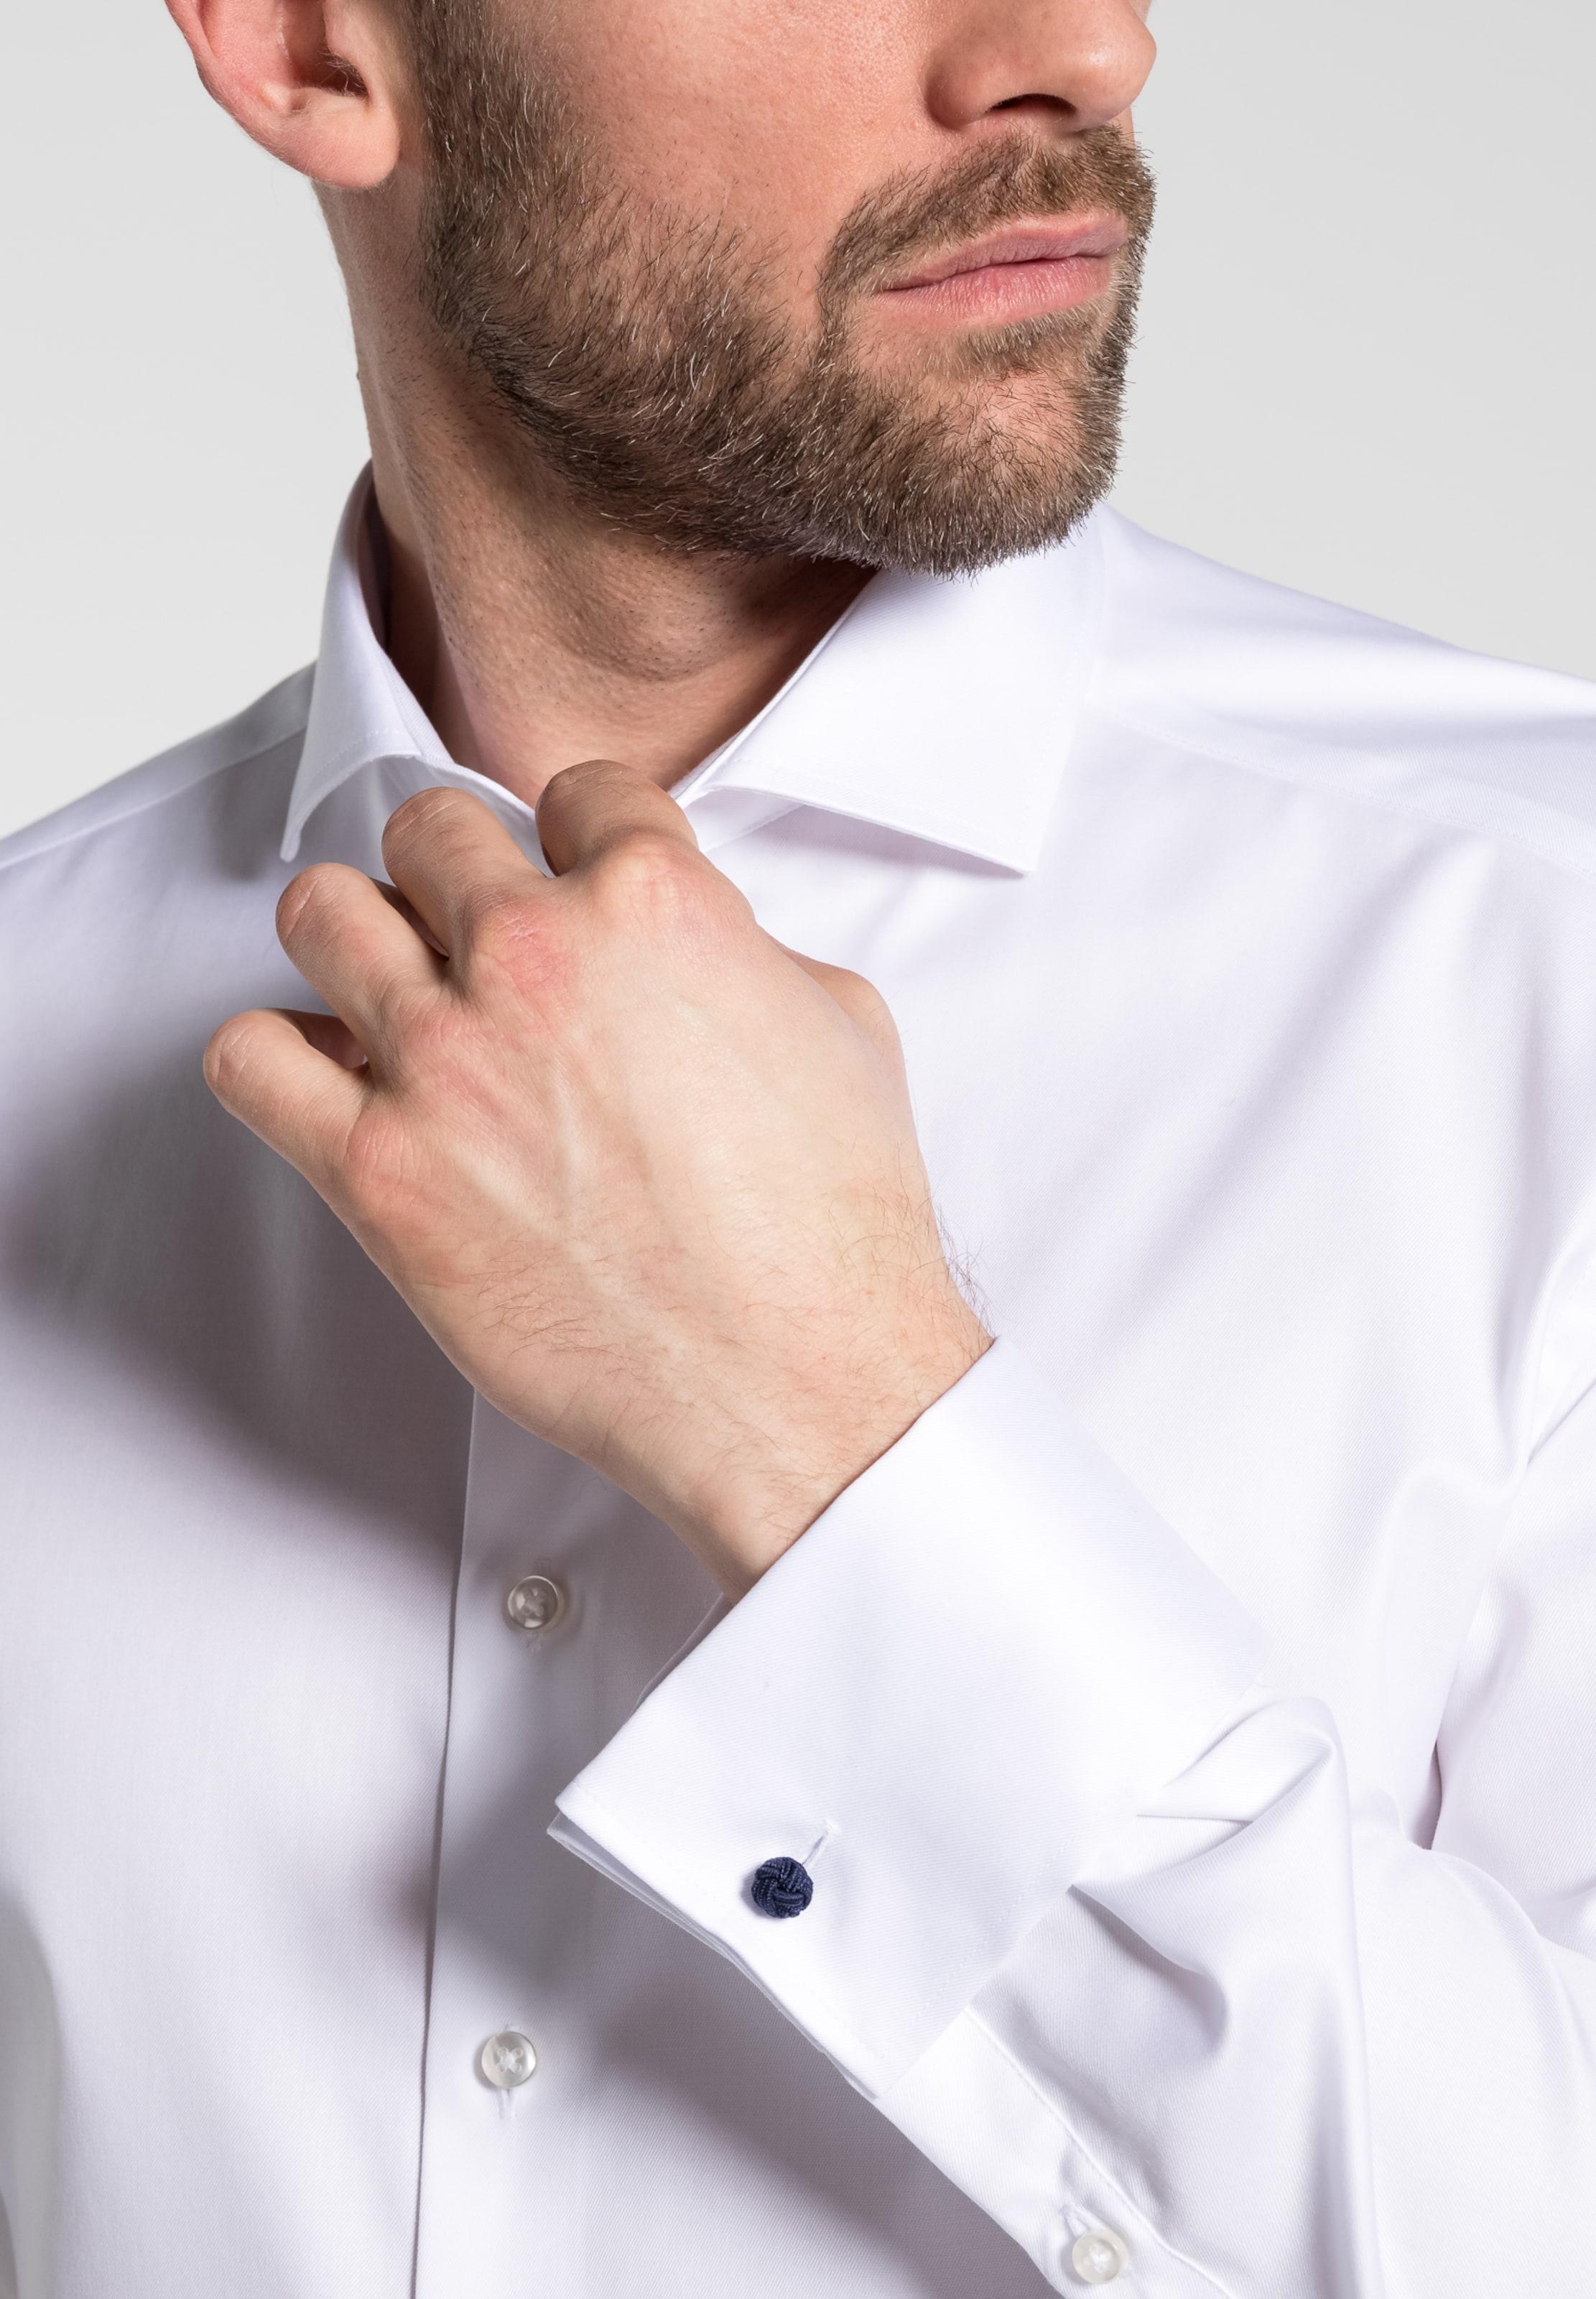 Günstigsten Preis ETERNA Langarm Hemd 'MODERN FIT' Billig Verkaufen Billig PjVxj8s